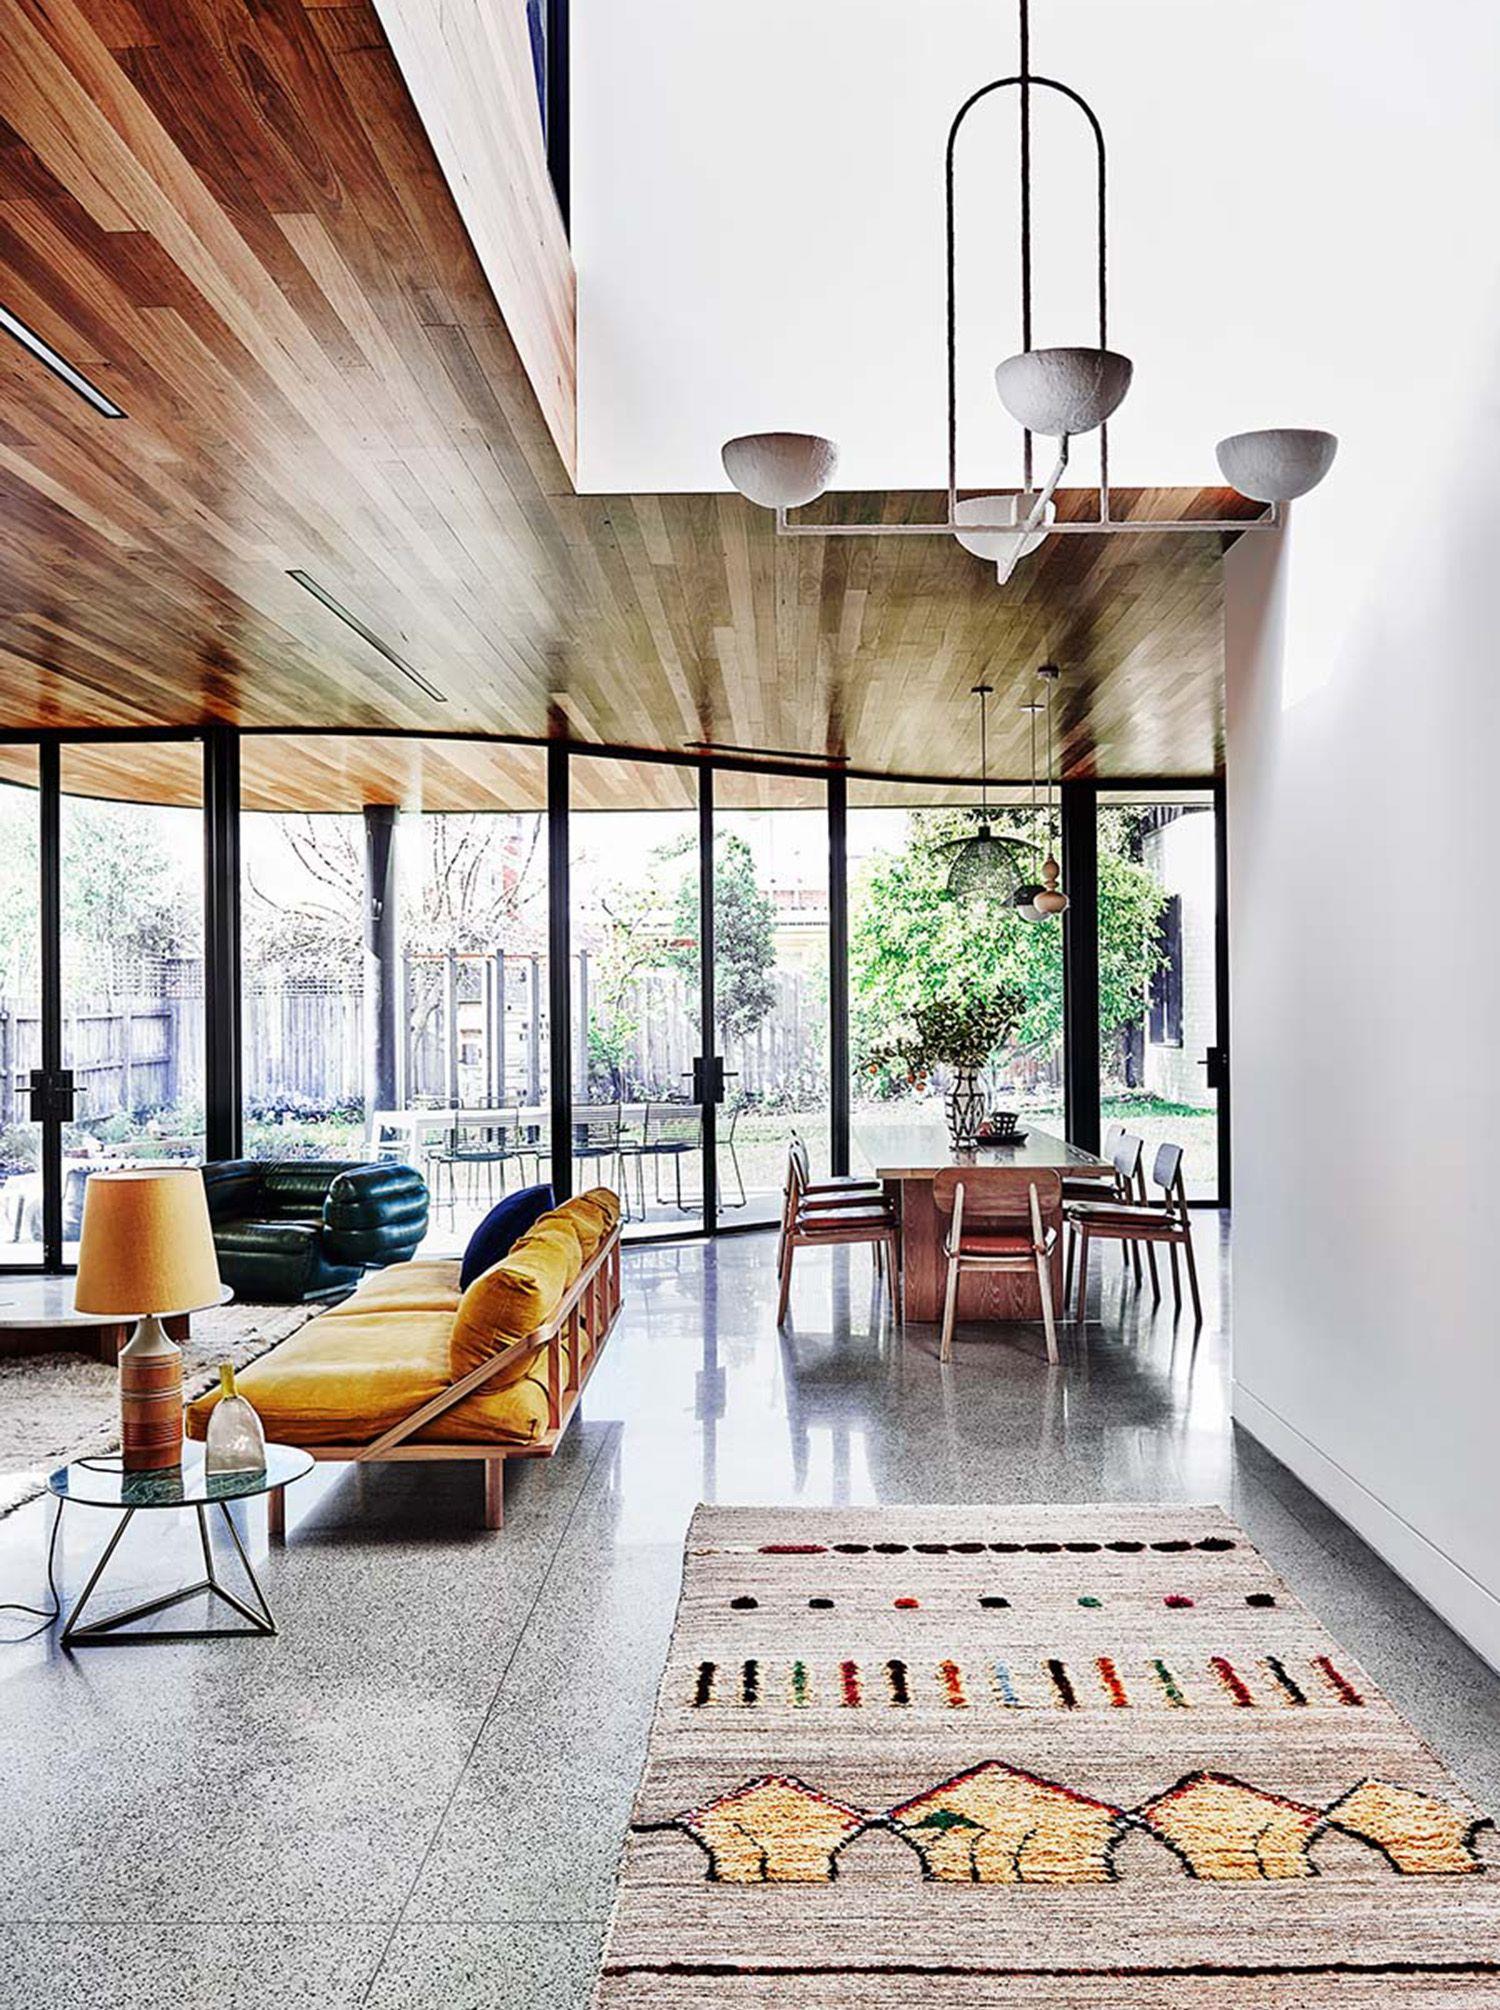 IDEA 2016 Shortlist Deco House by Amber Road | Lisa Cohen